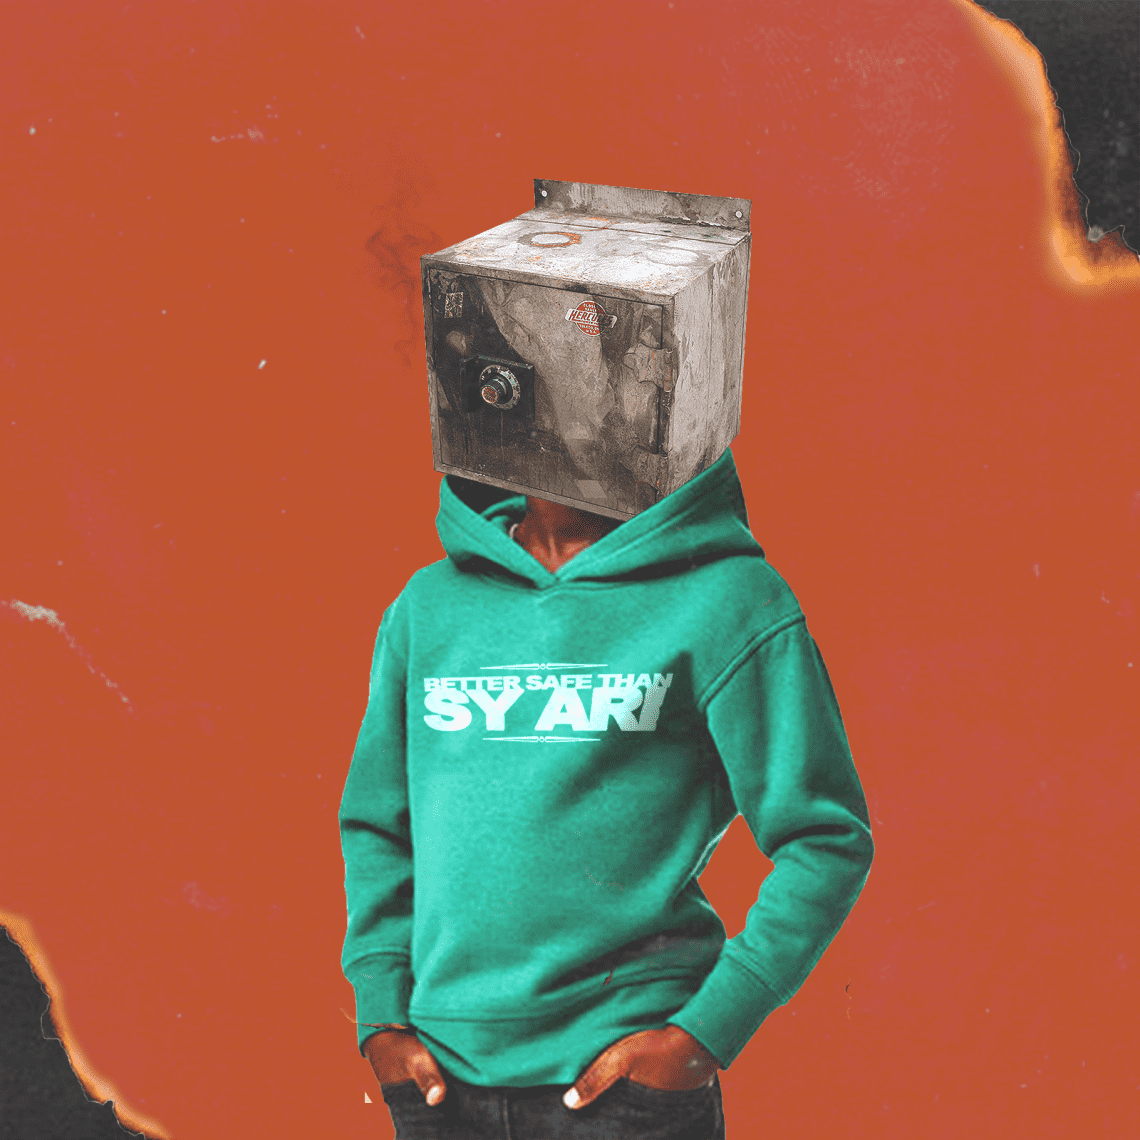 "Sy Ari Da Kid Surprise Drops ""Better Safe Than Sy Ari"" EP"